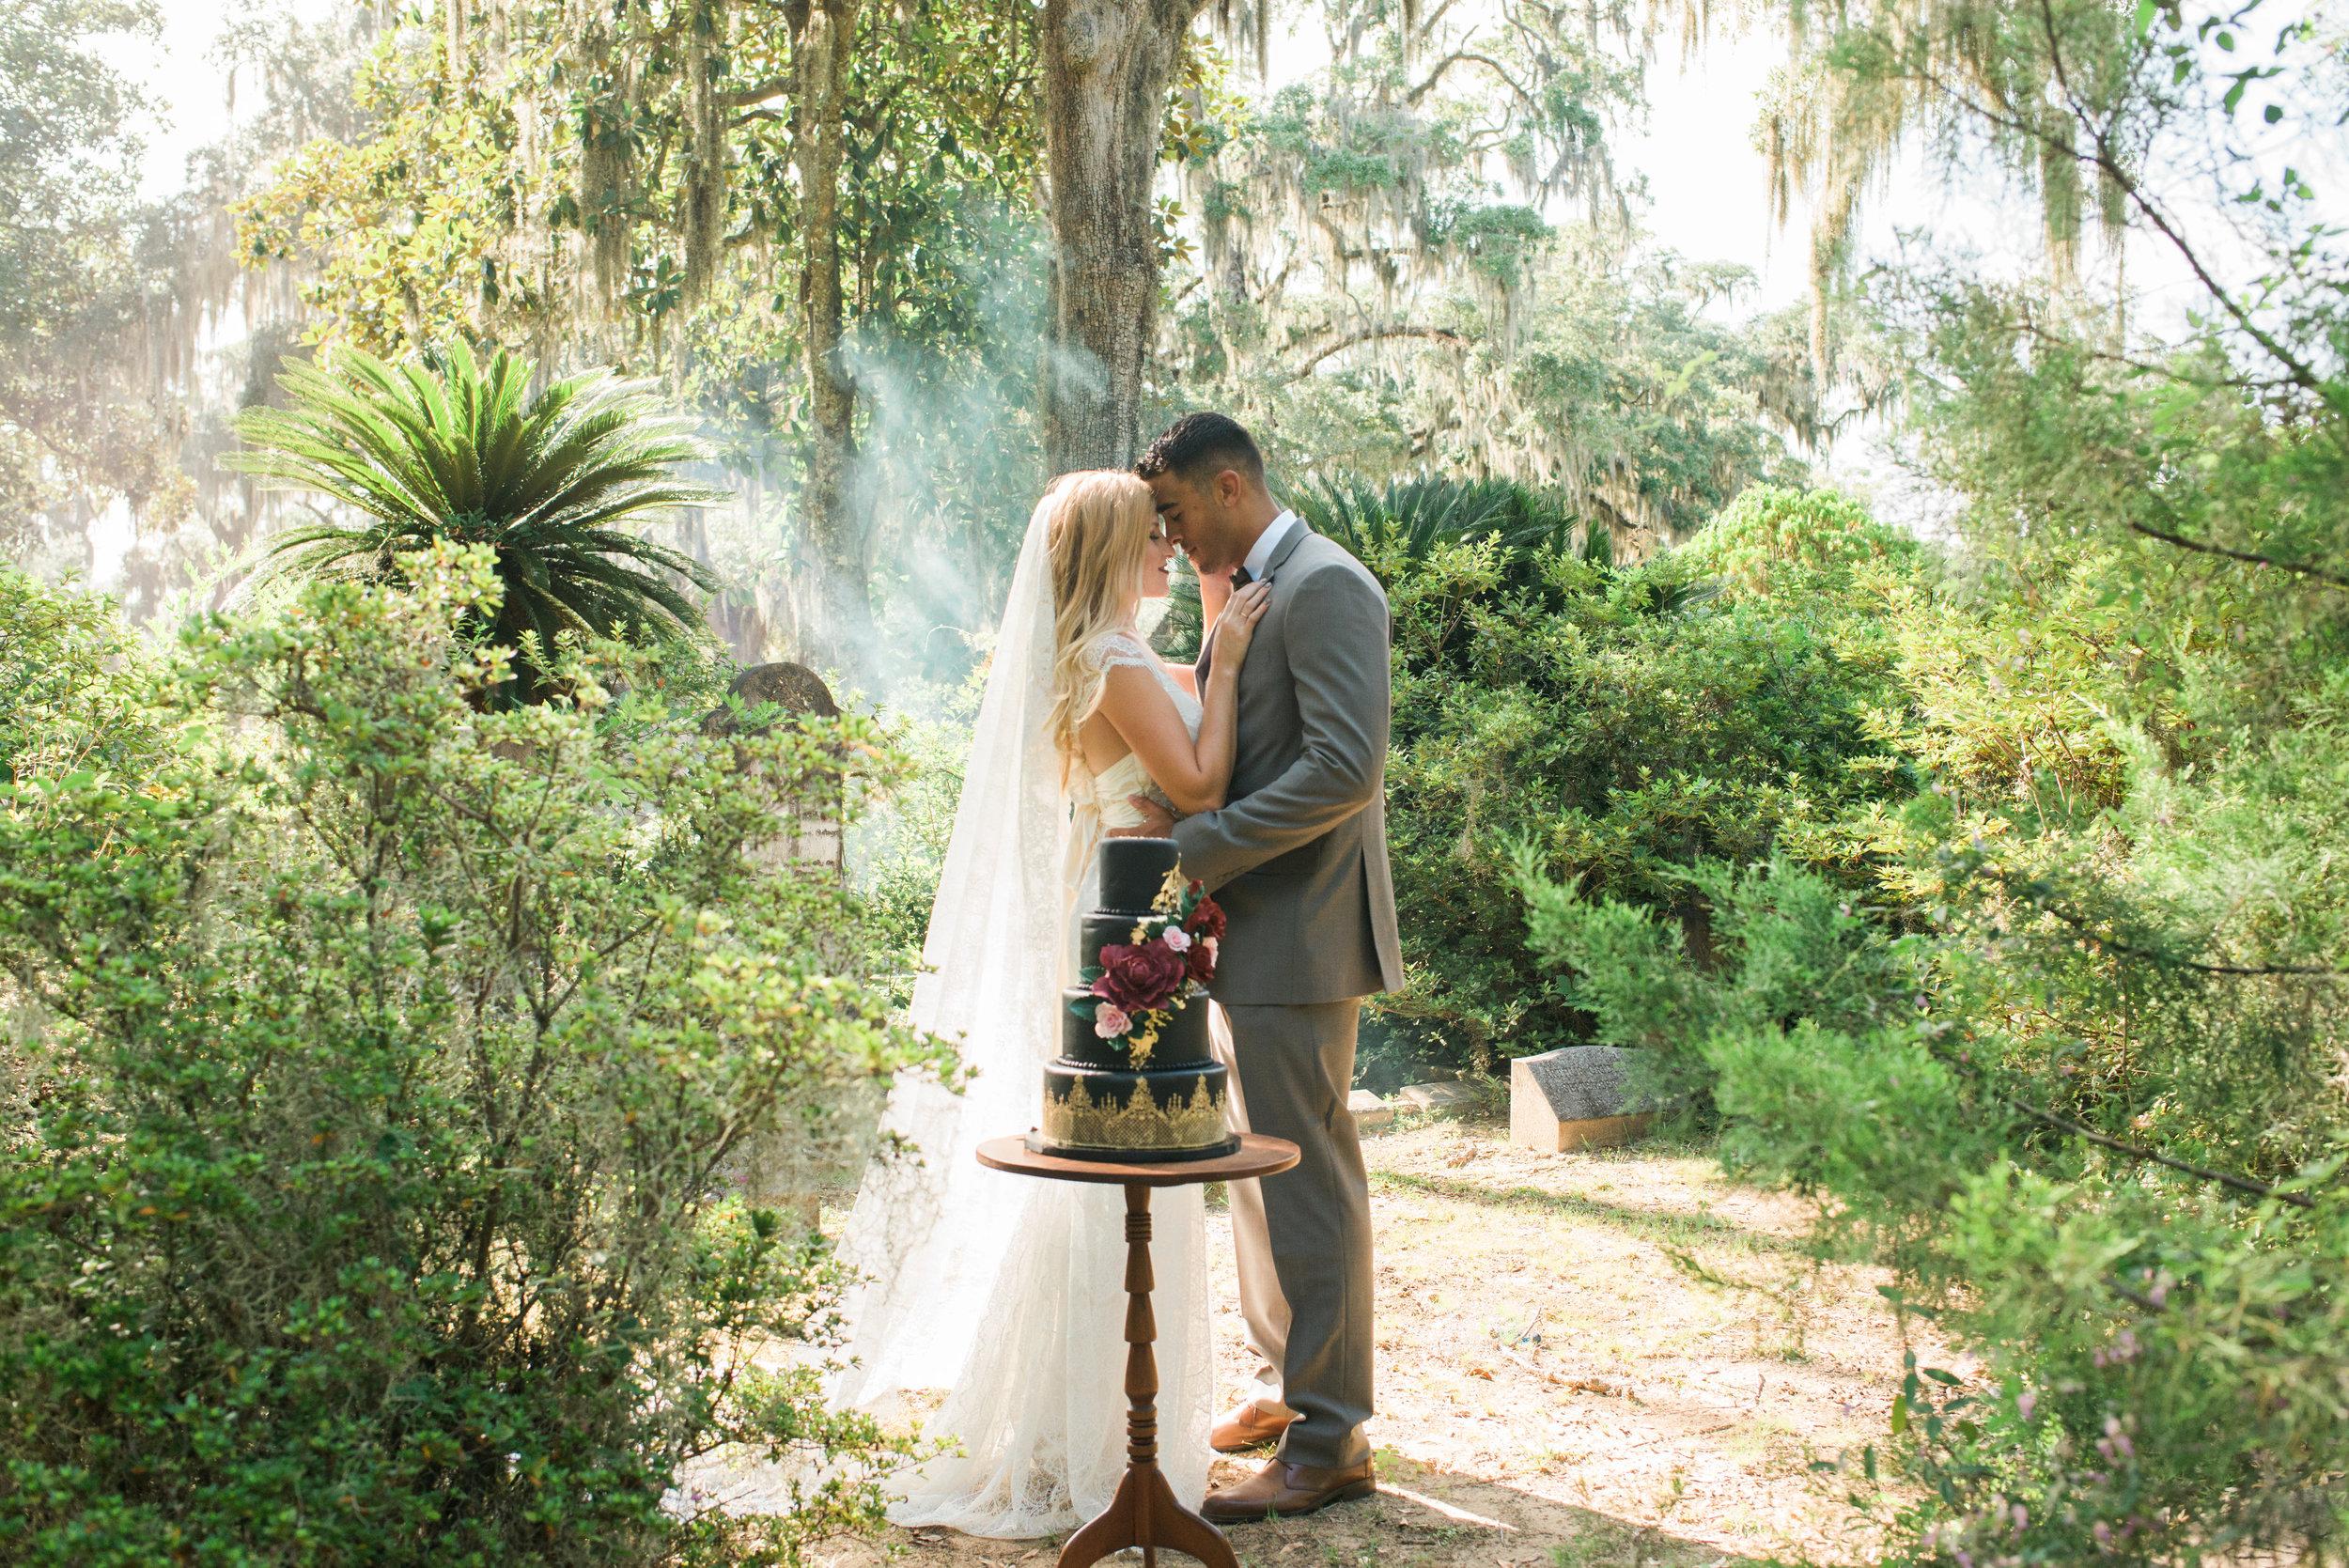 callie-beale-photography-Bonaventure-cemetery-michelle-royal-makeup-cemetery-wedding-ivory-and-beau-wedding-planning-anna-campbell-harper-savannah-bridal-boutique-savannah-wedding-dresses-savannah-weddings-15.jpg